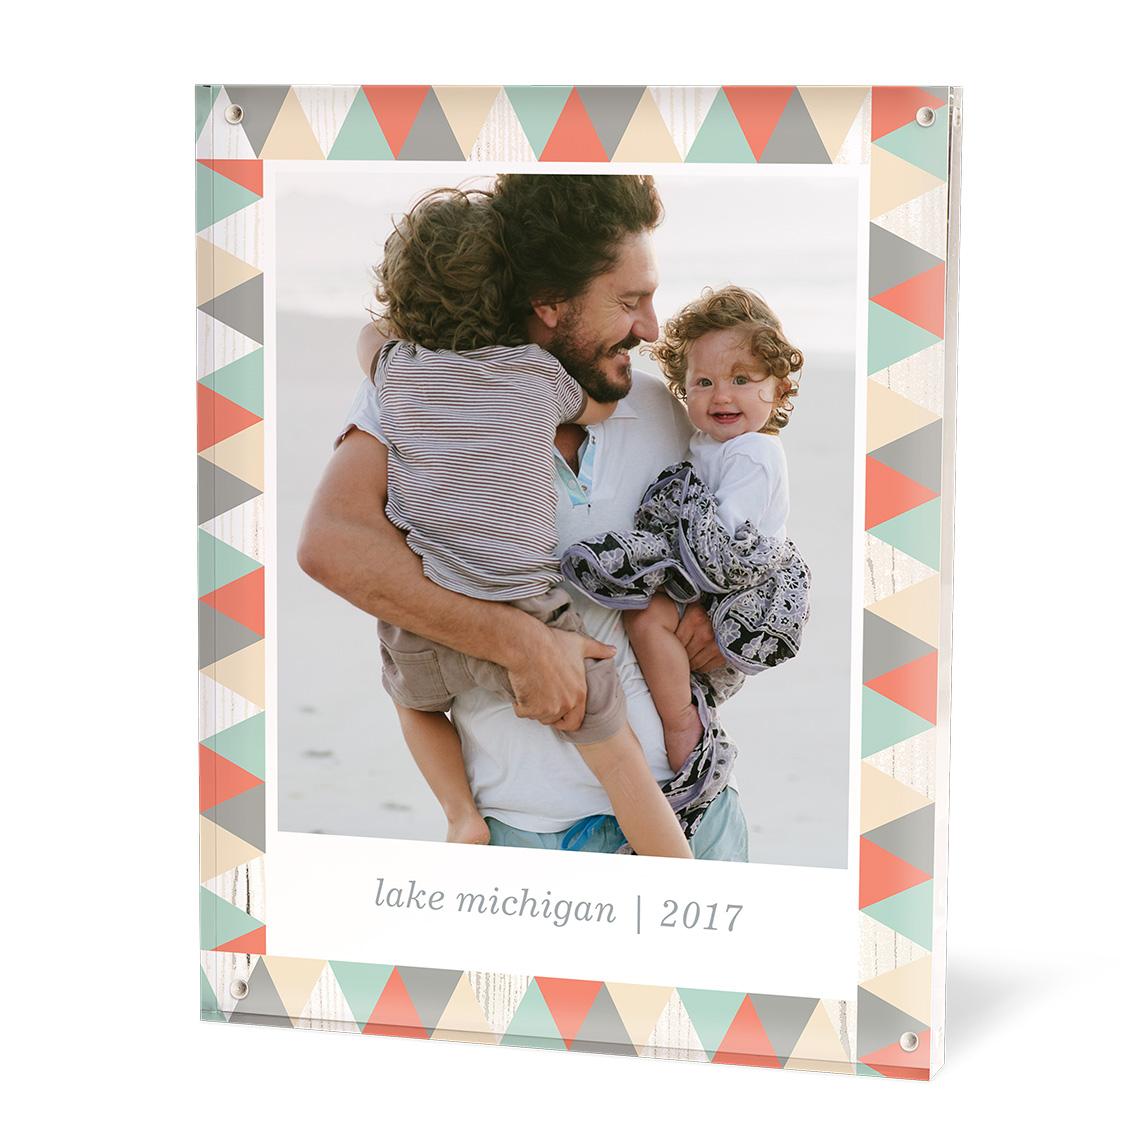 Pictures framed and delivered 6.1